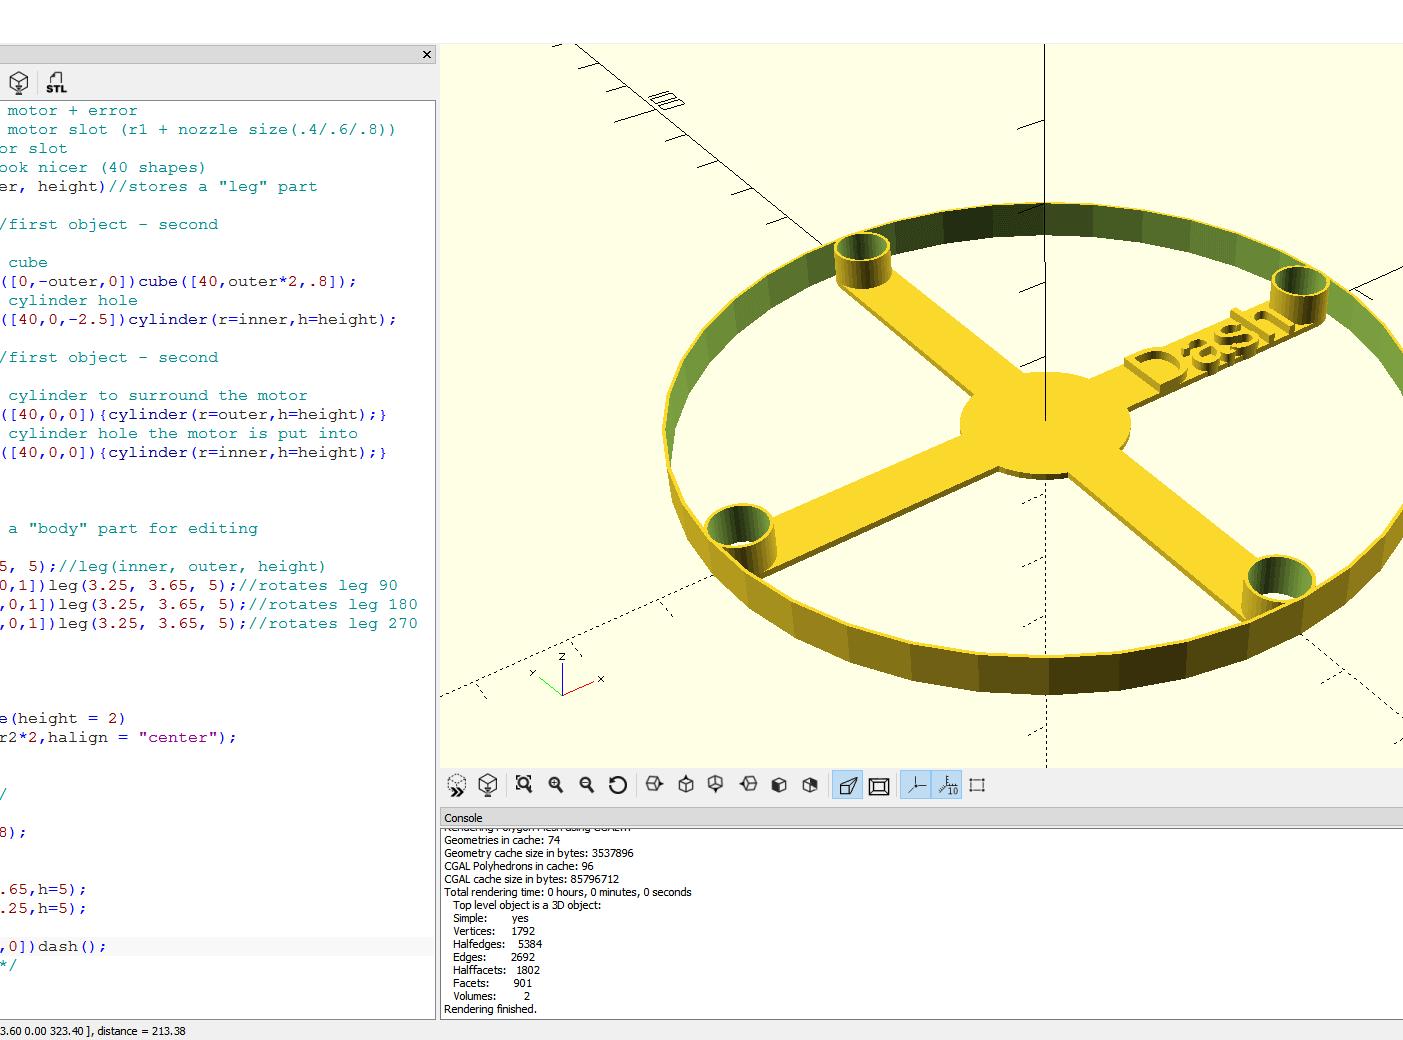 Drones-3D-printing.png